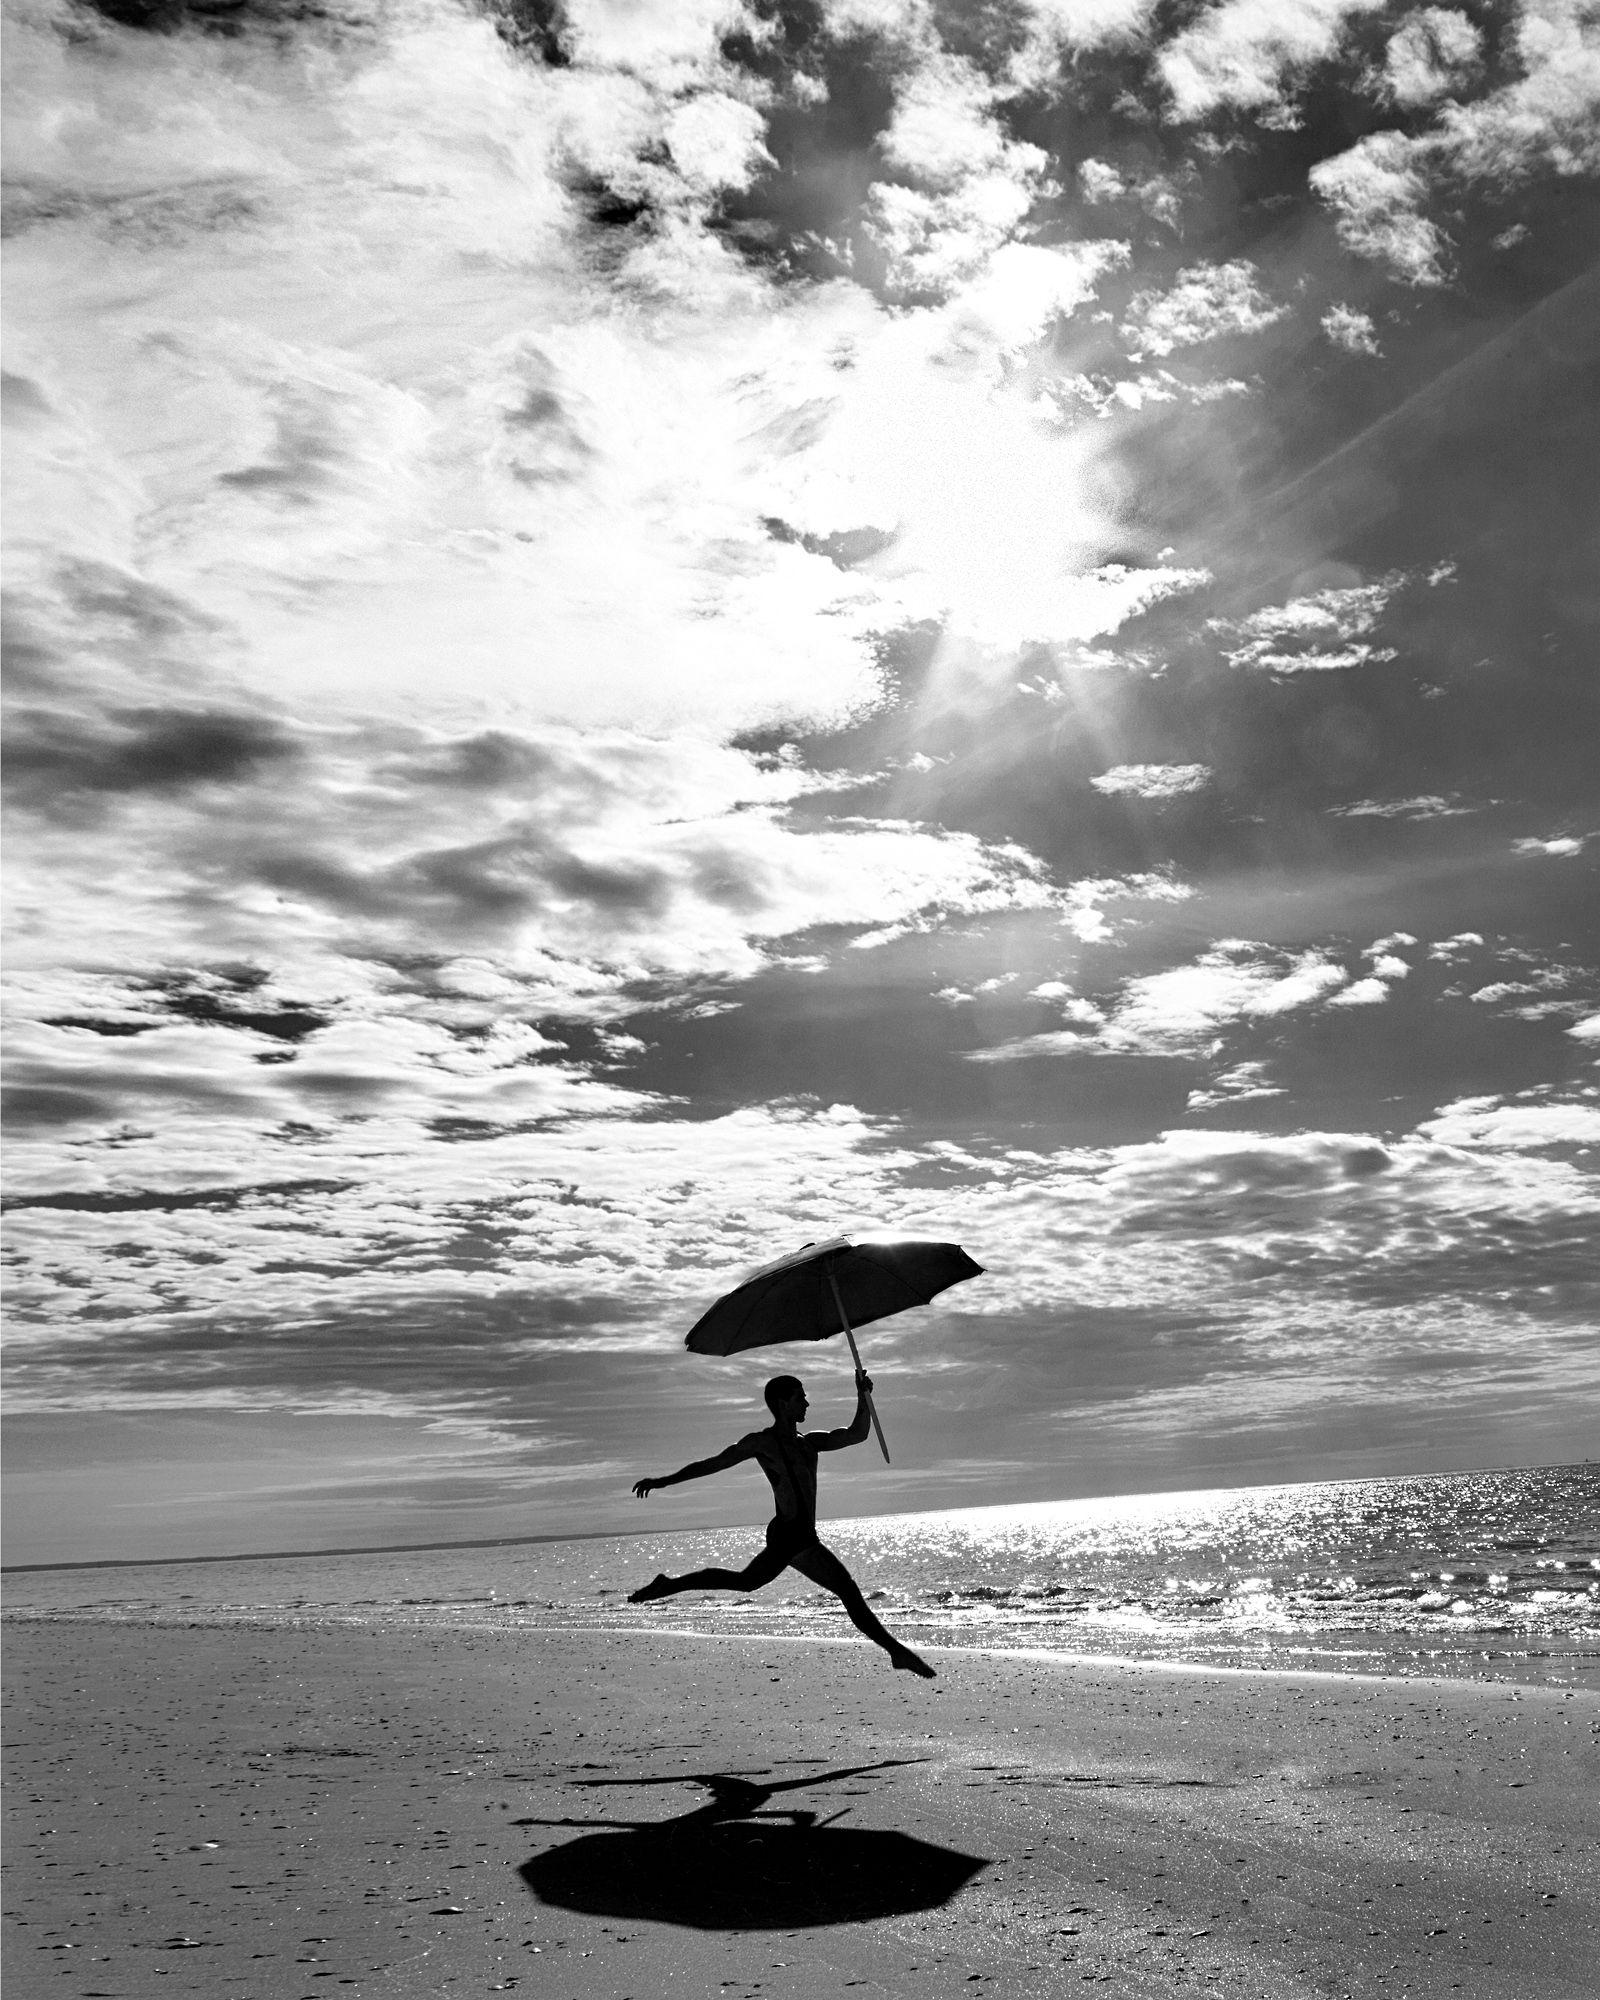 Dave_umbrella 2.jpg